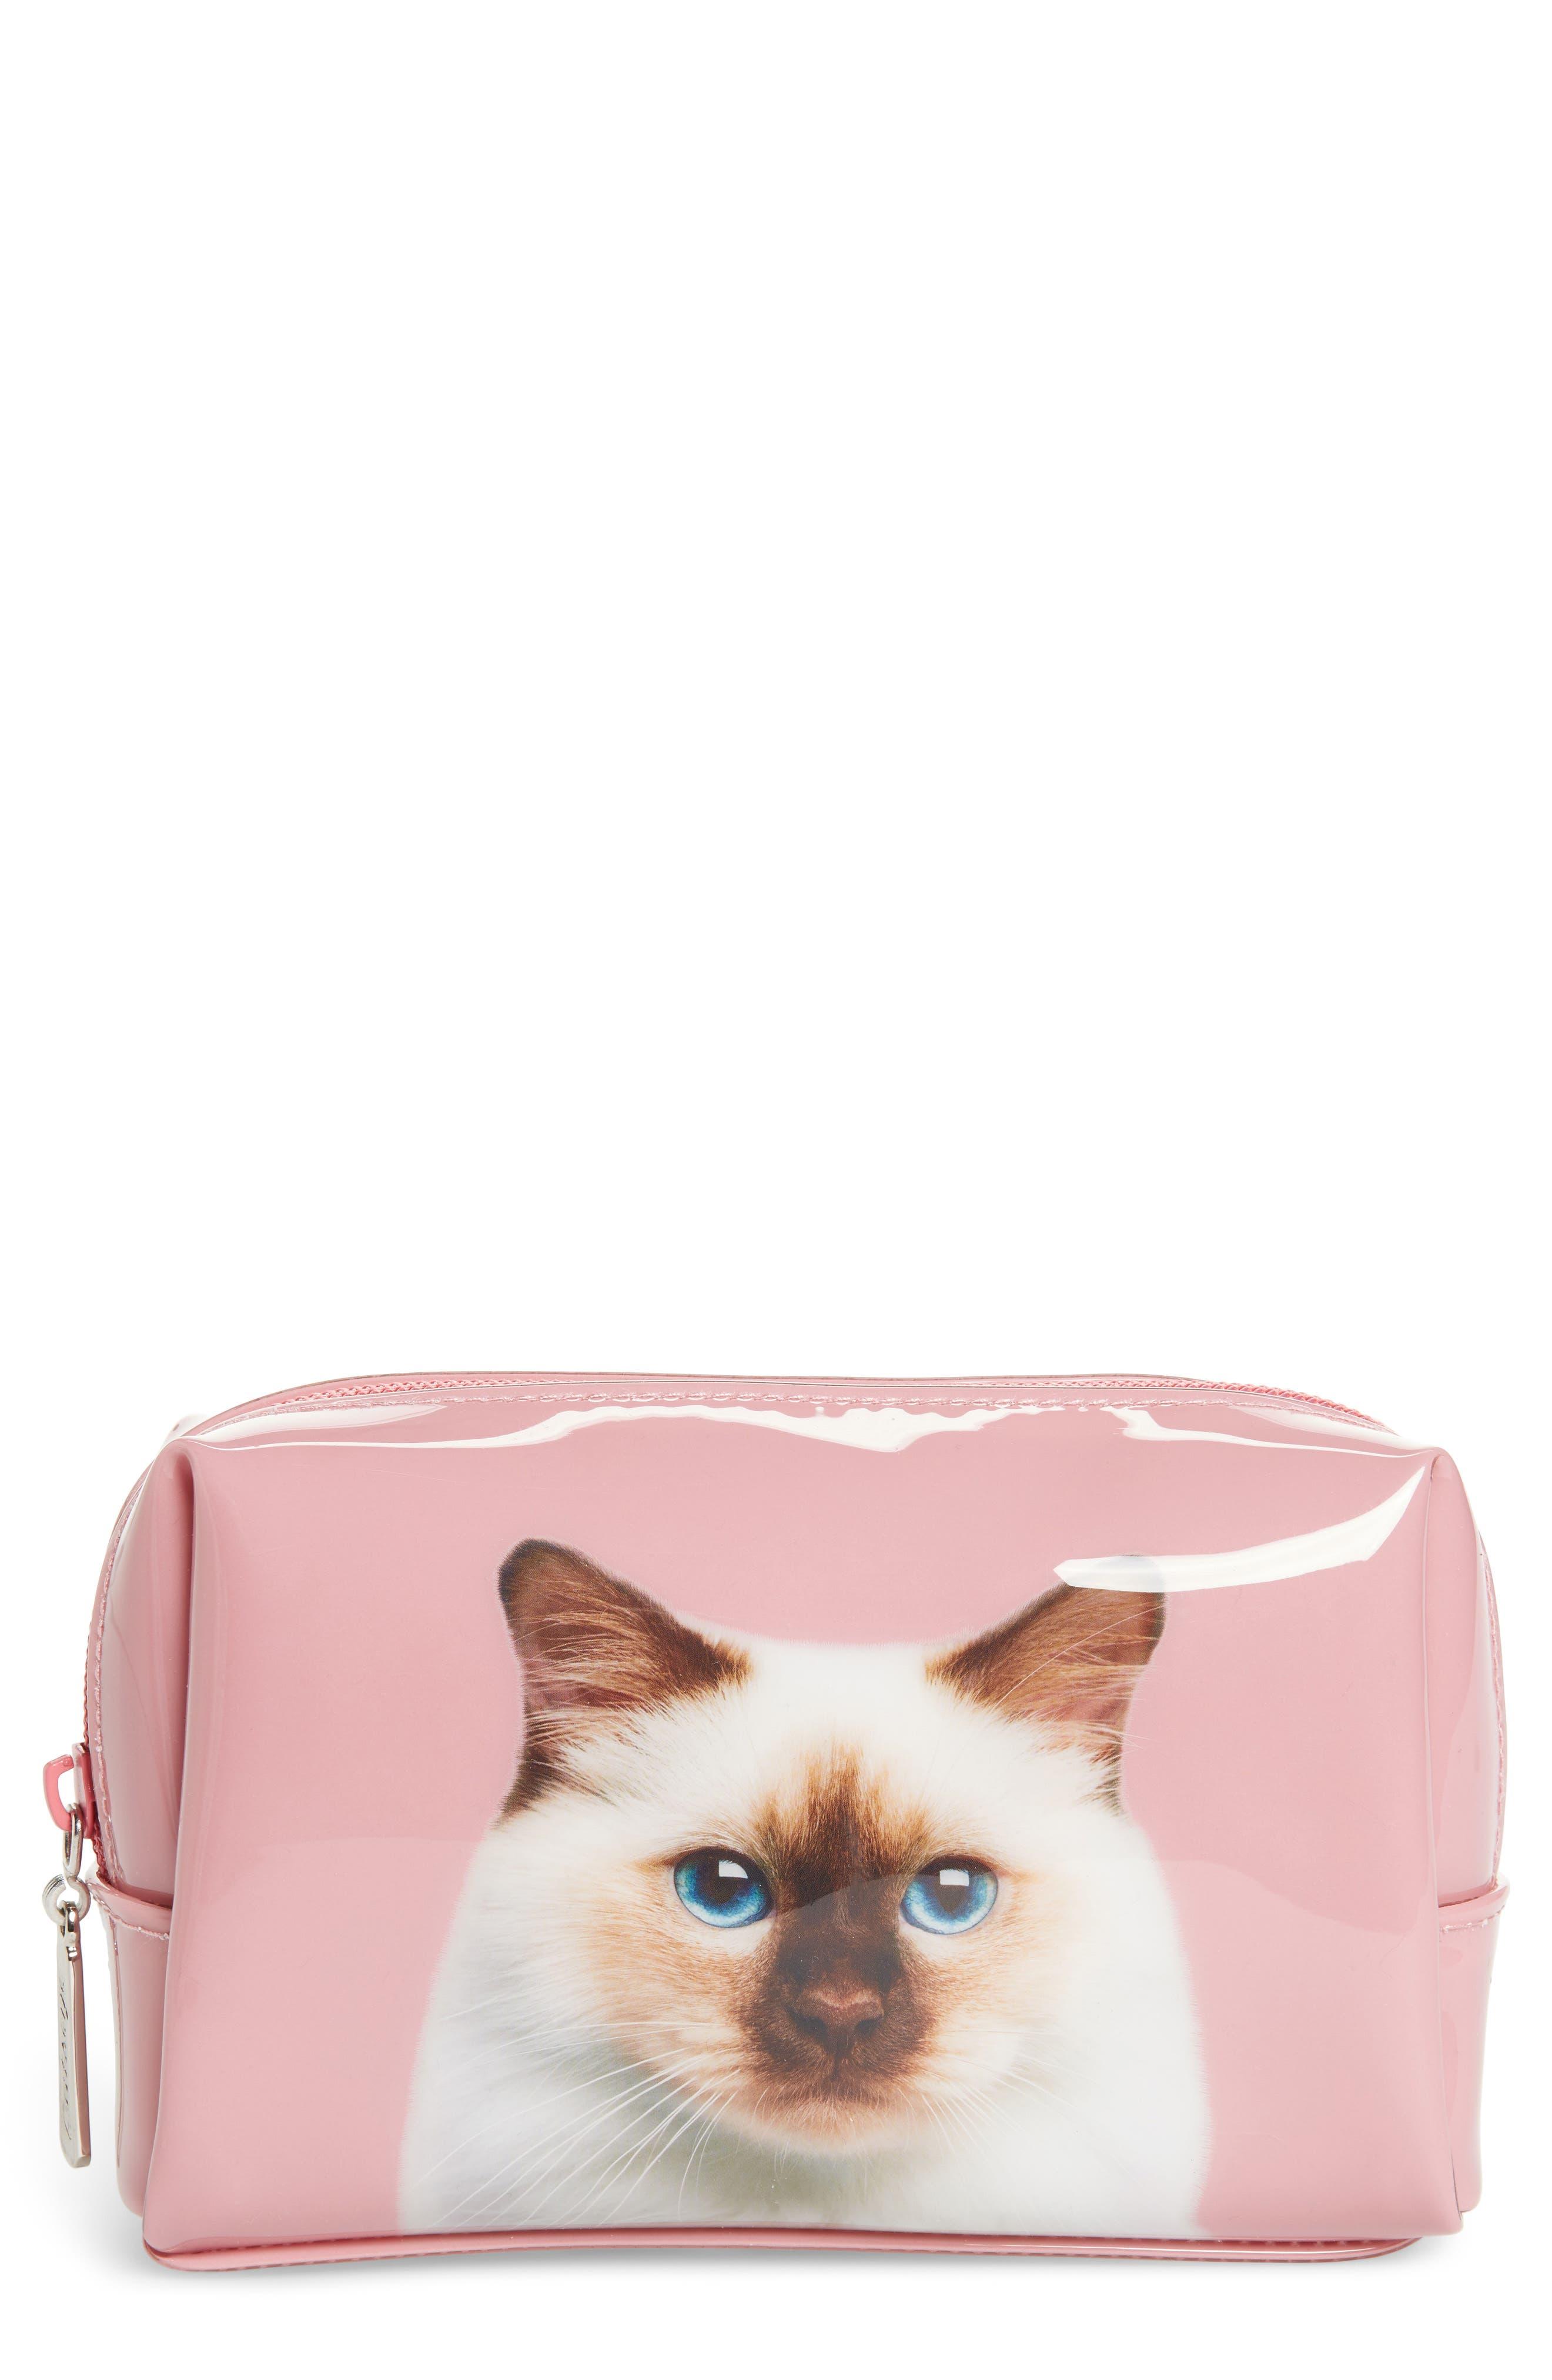 Catseye London Cat on Rose Cosmetics Case